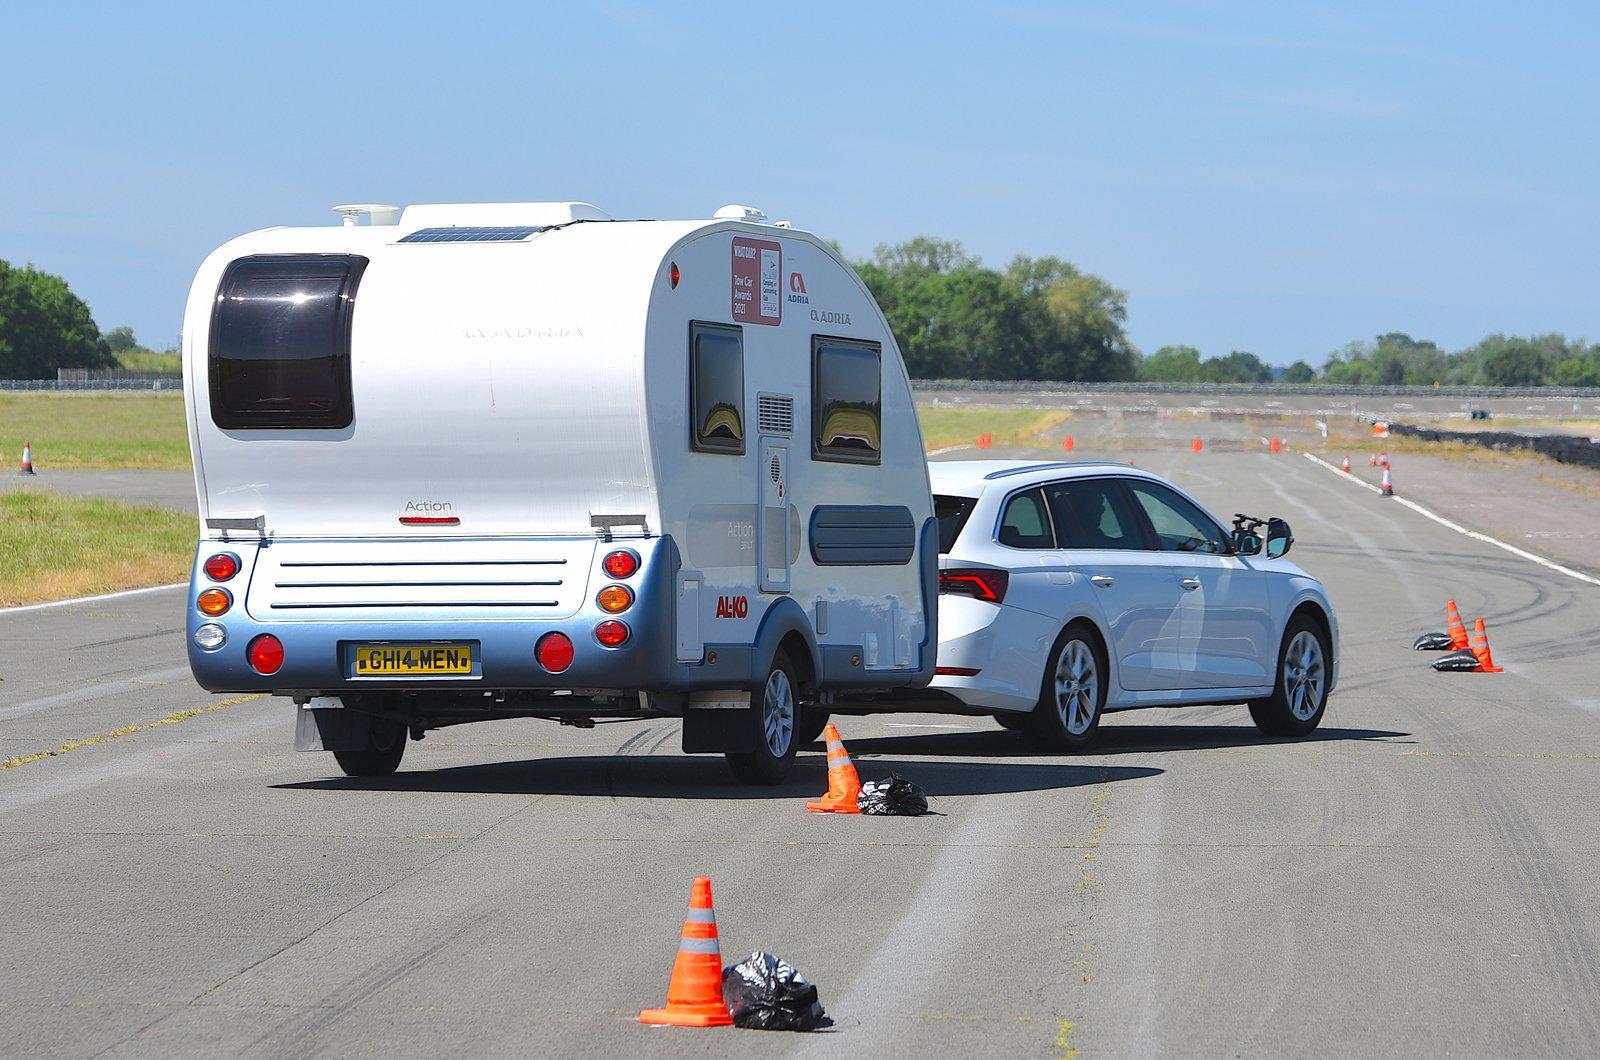 Tow Car Awards 2021 - lane change stability test